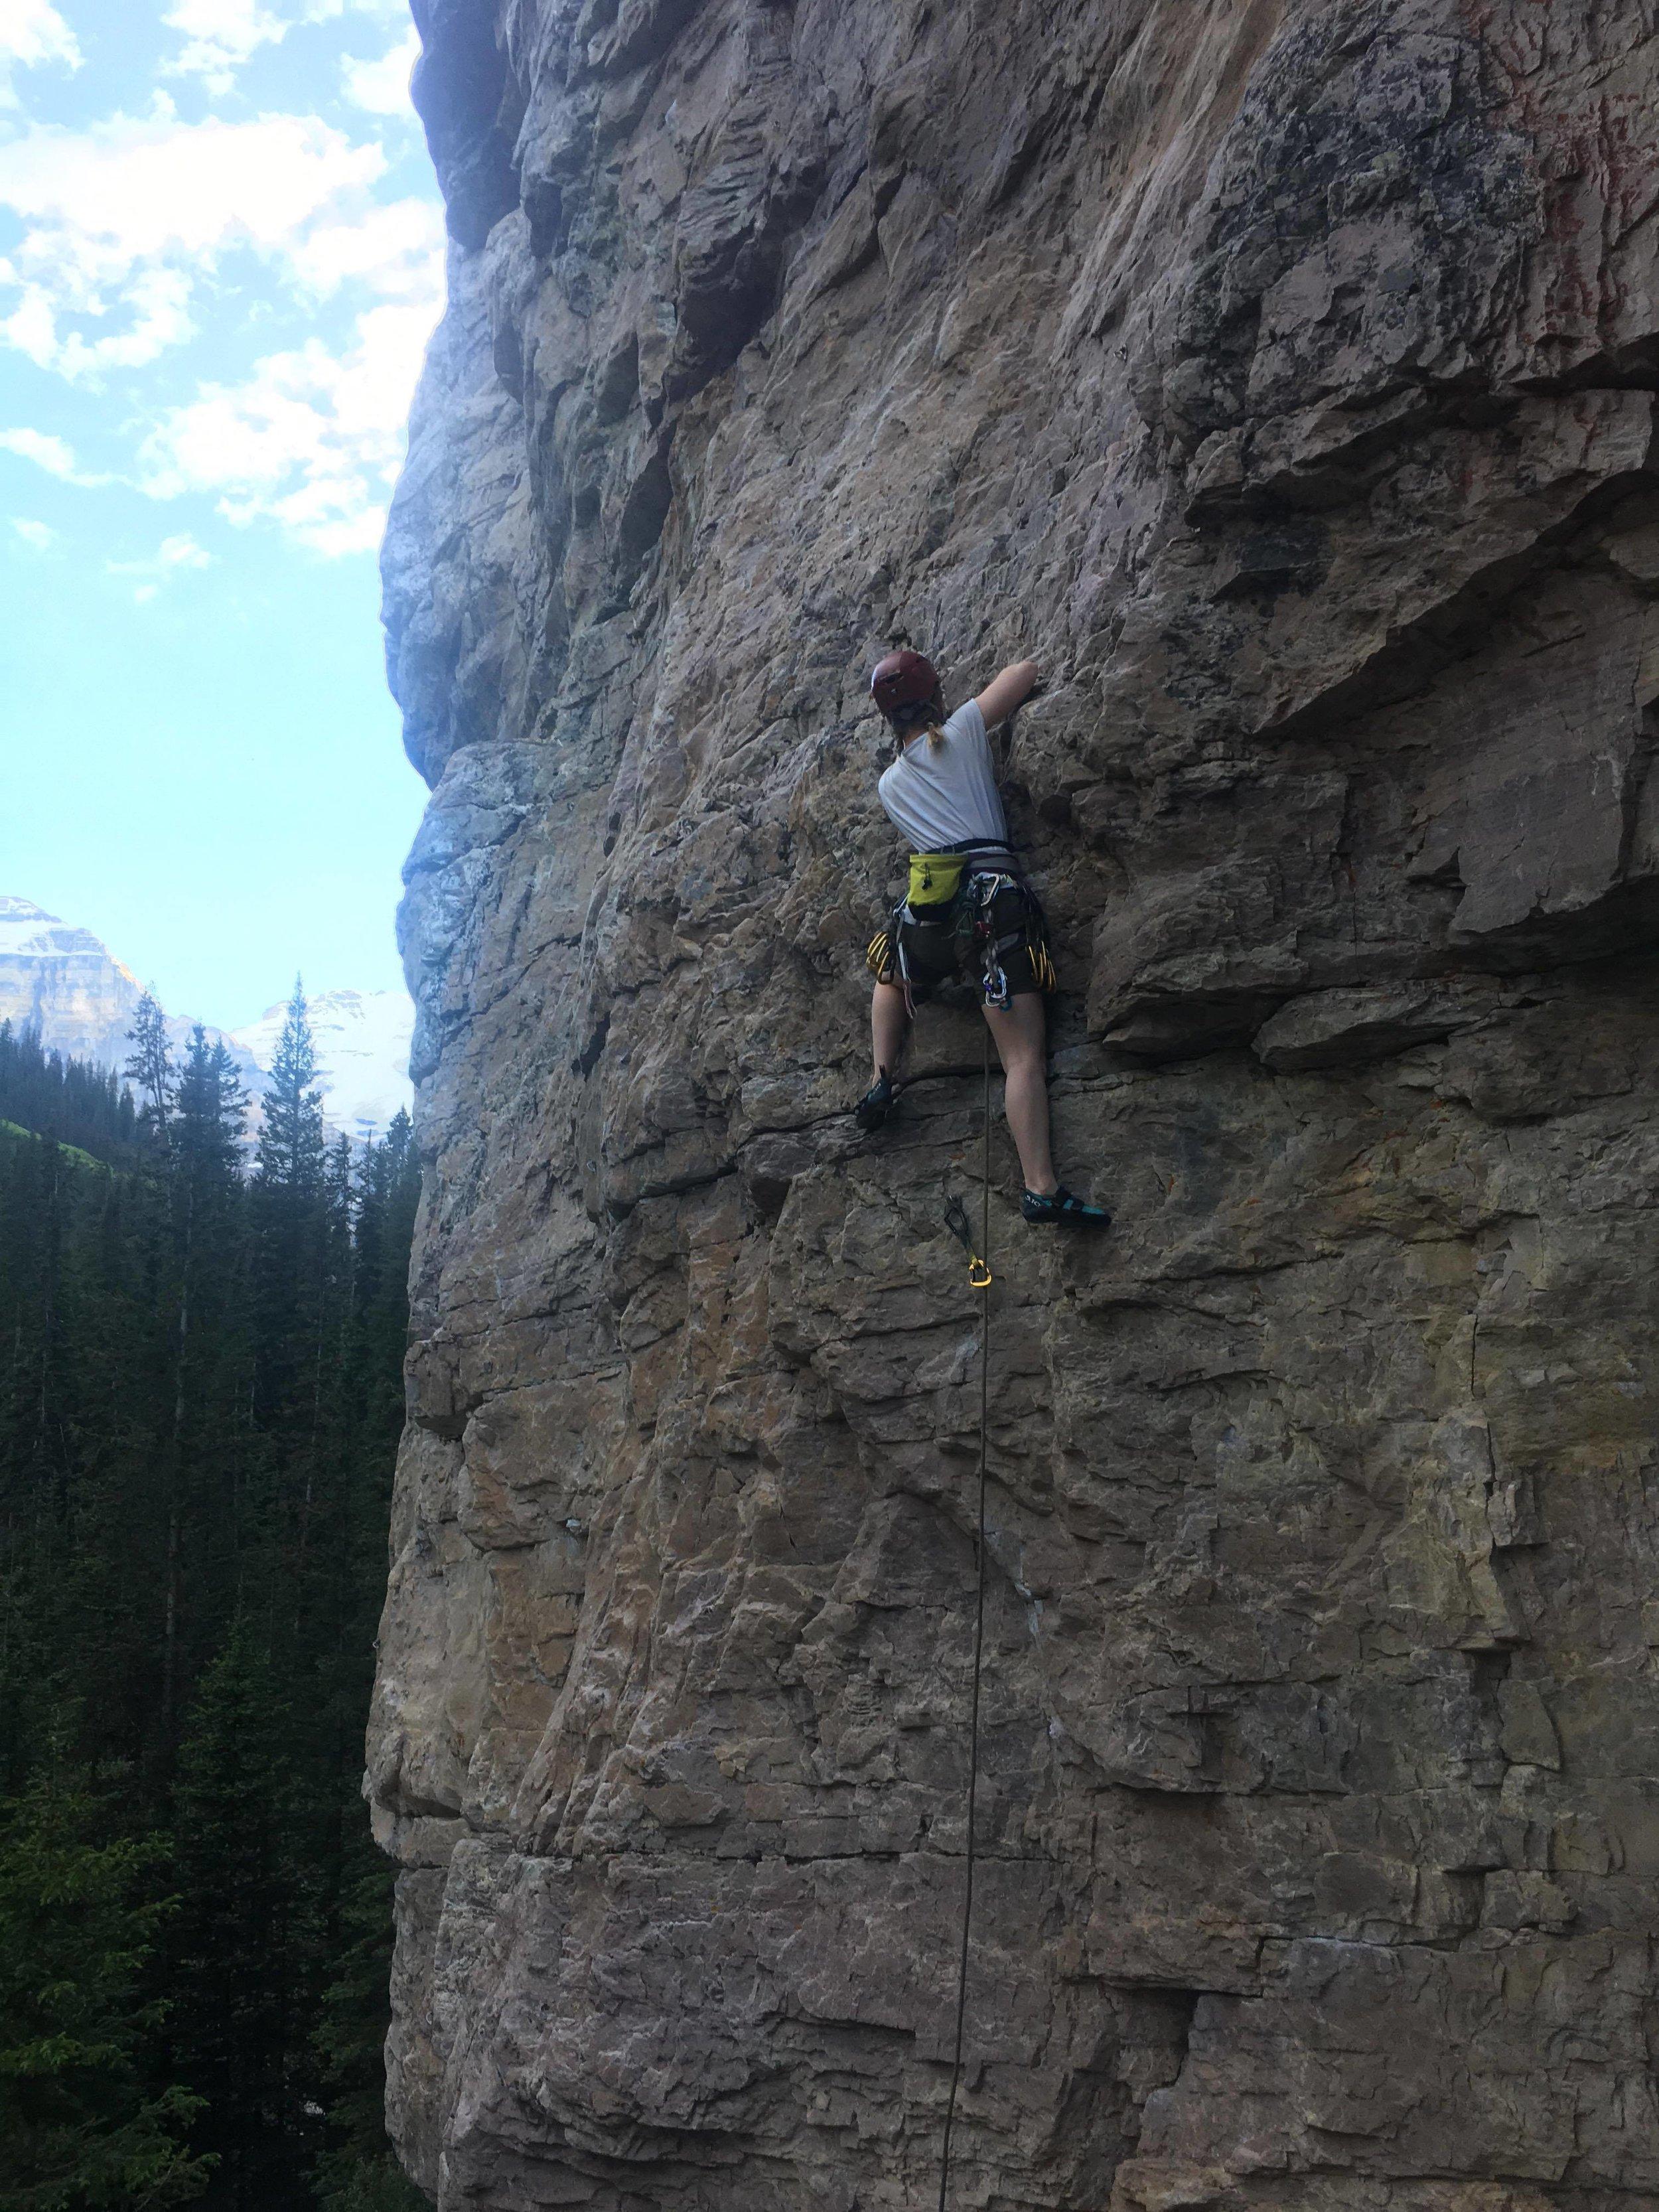 Rosa climbing in Canada.  Image credit: Rosa Pearce